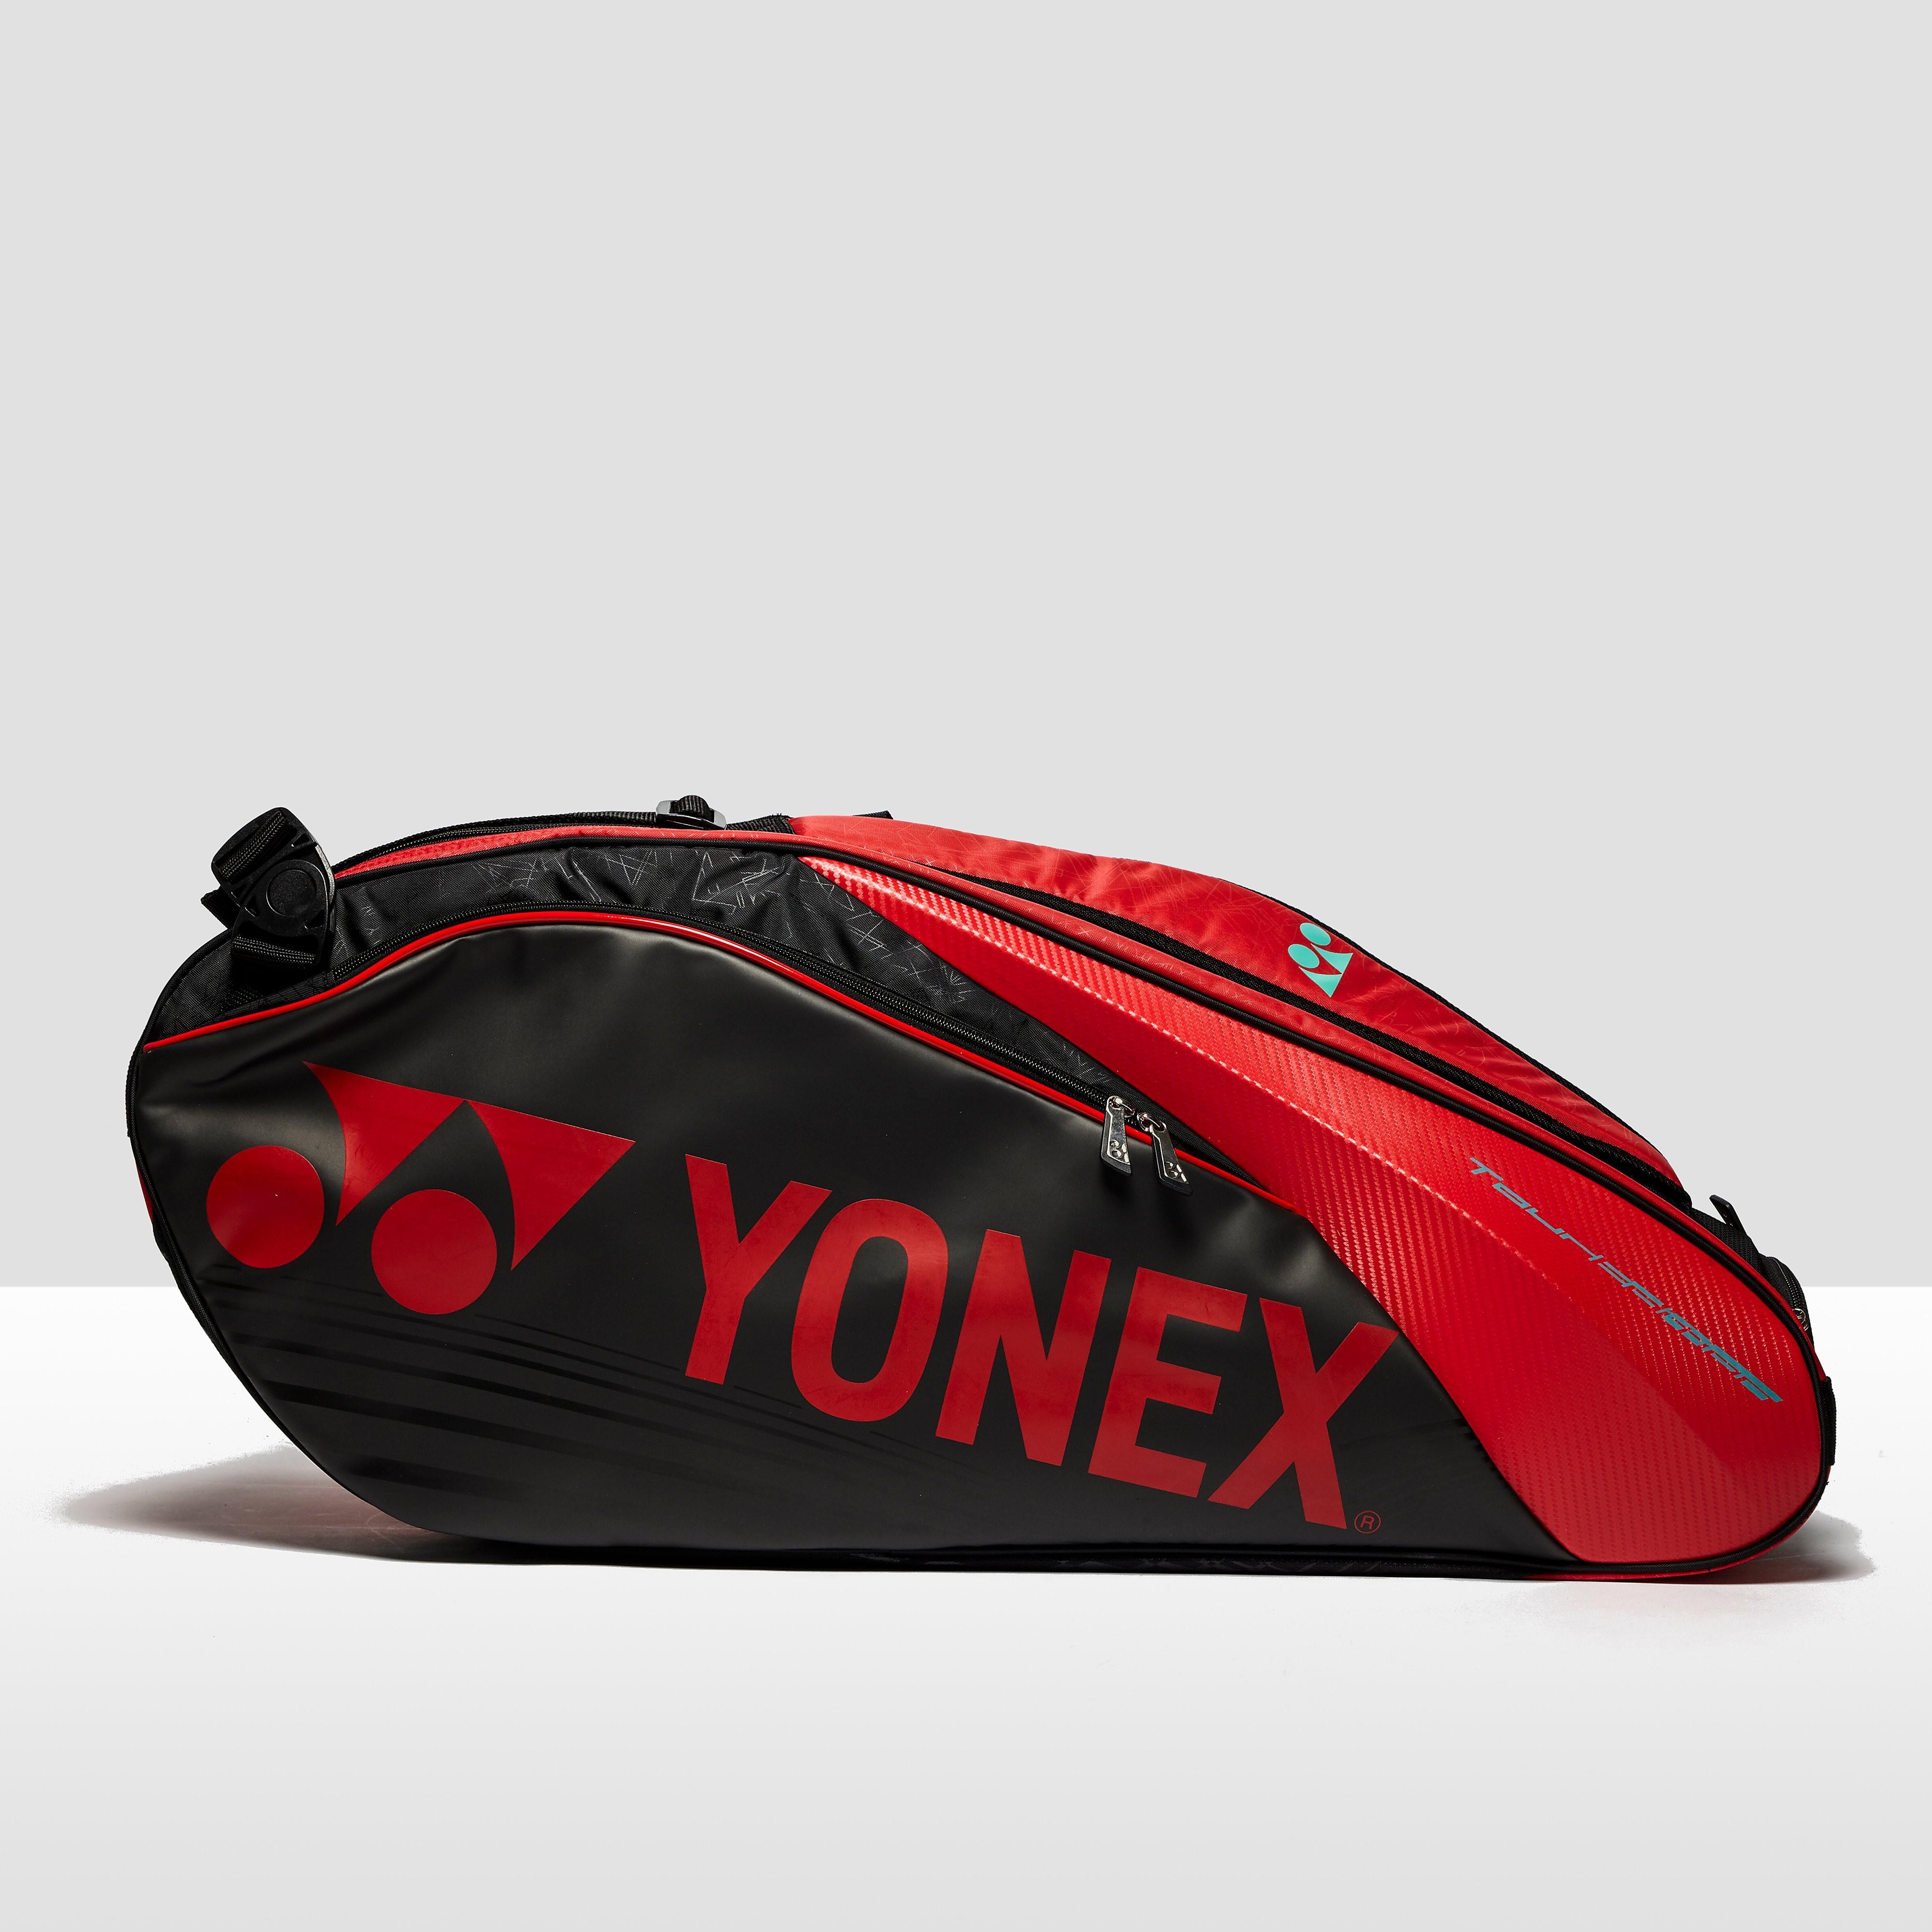 Yonex Pro X9 Racket Bag